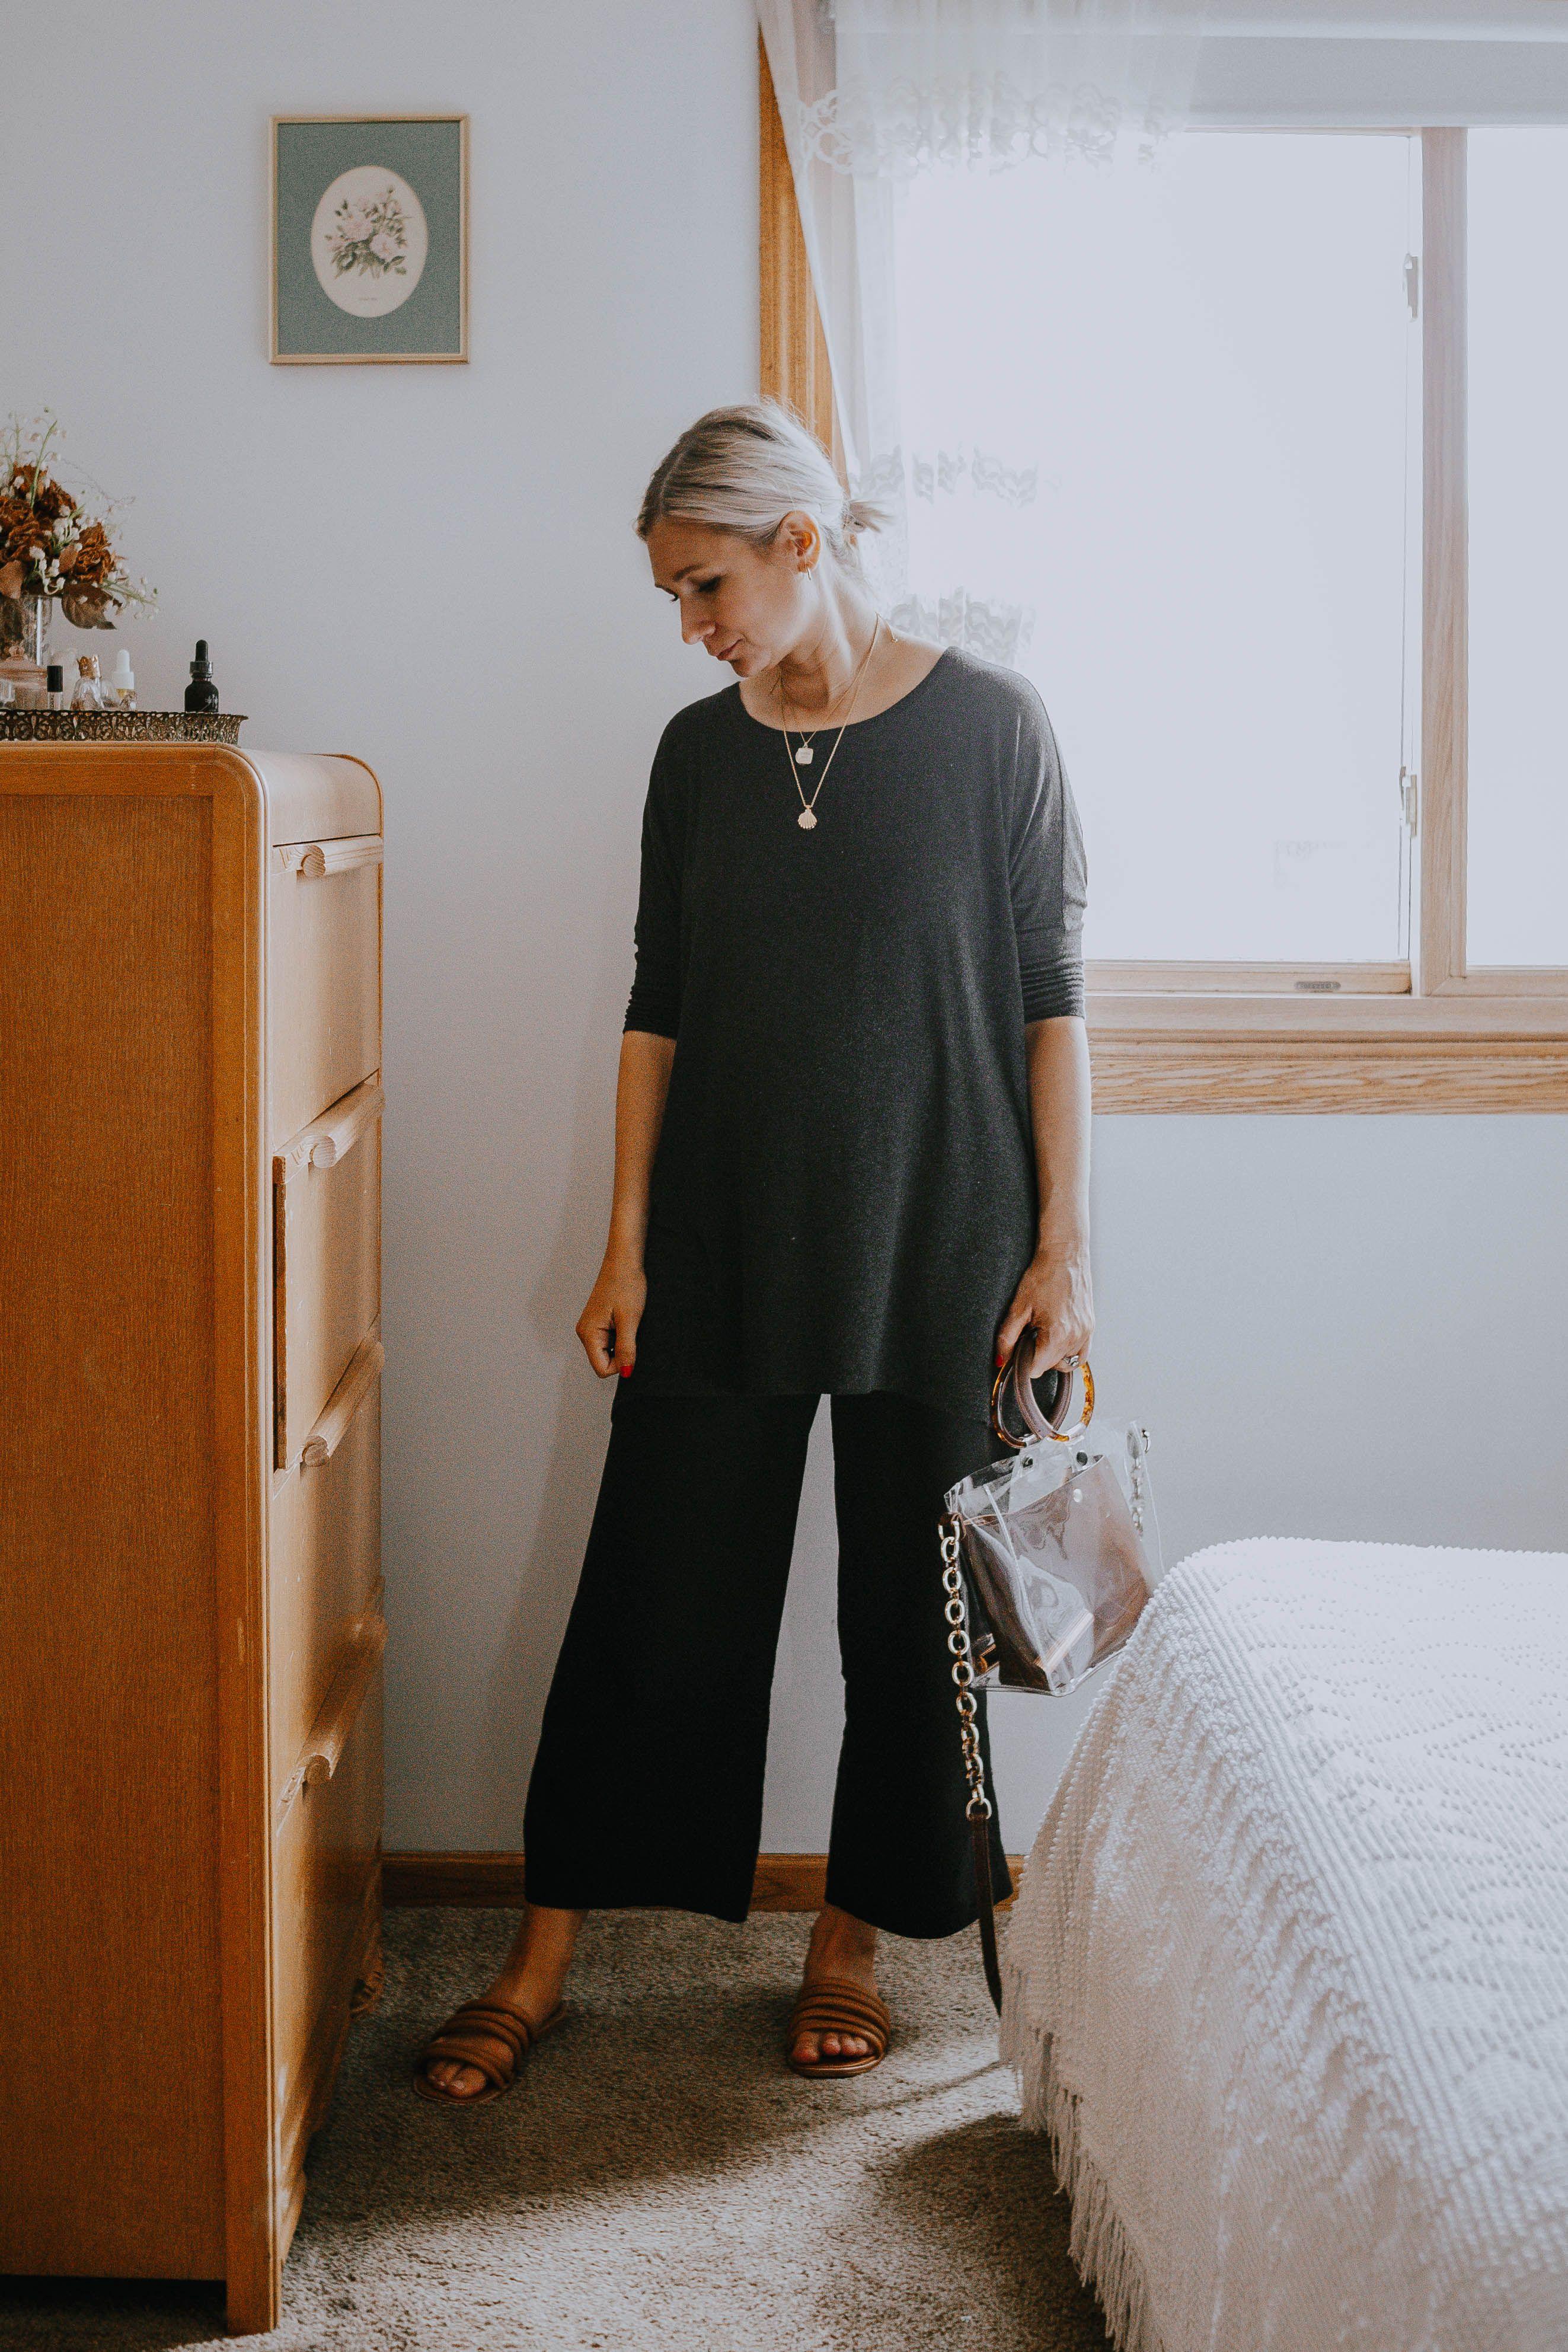 Karin Emily | What I Wore Last Week: wide leg maternity pants